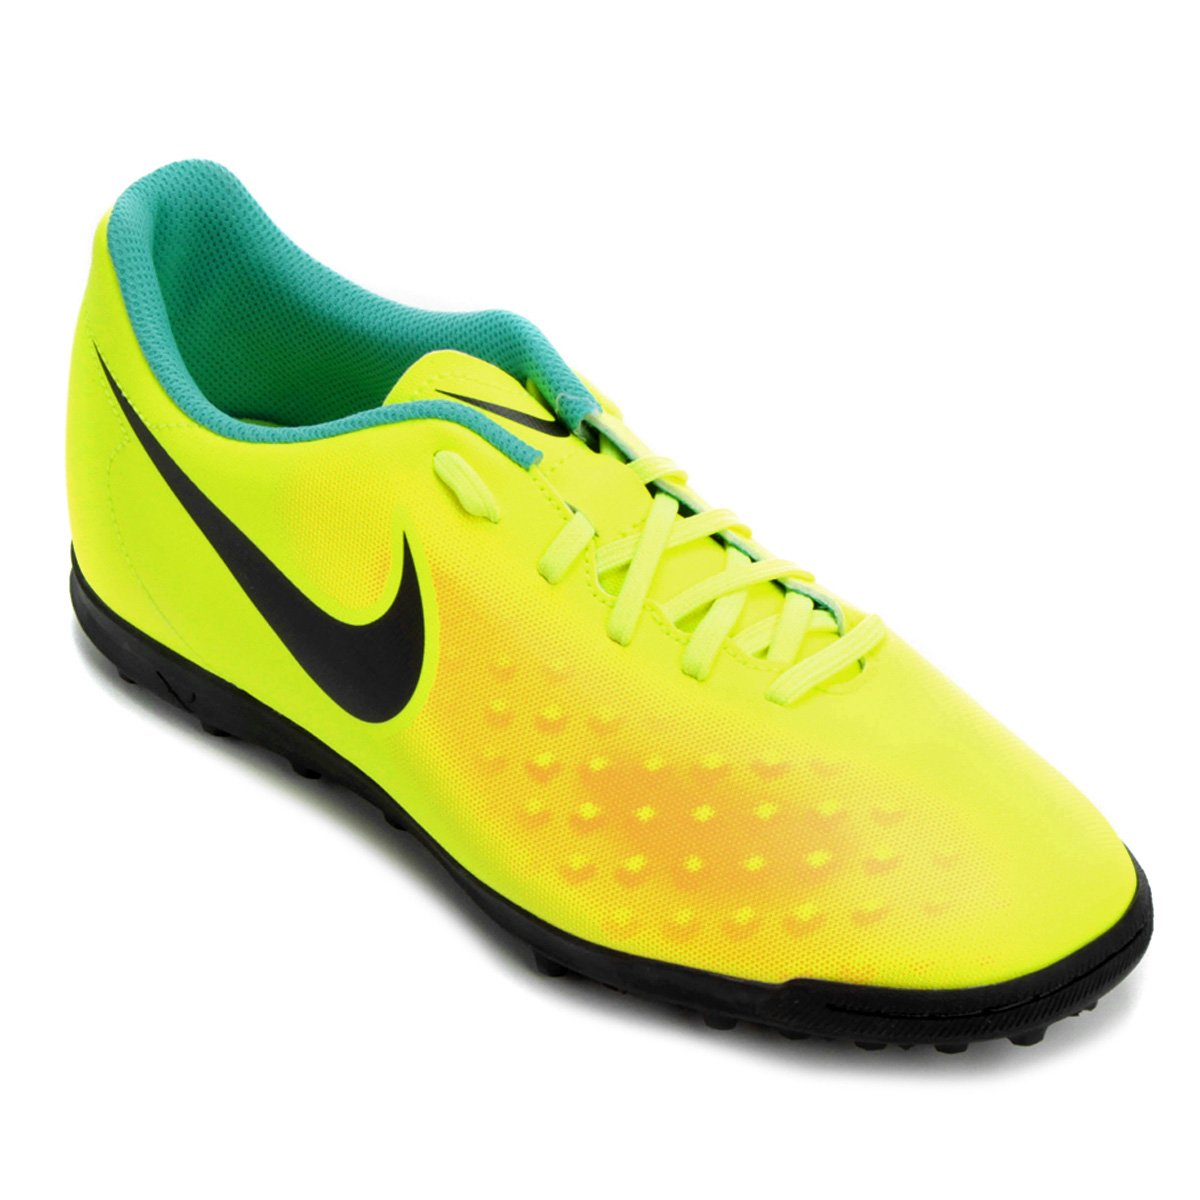 28c71a07c8c47 Chuteira Society Nike Magista Ola II TF - Compre Agora